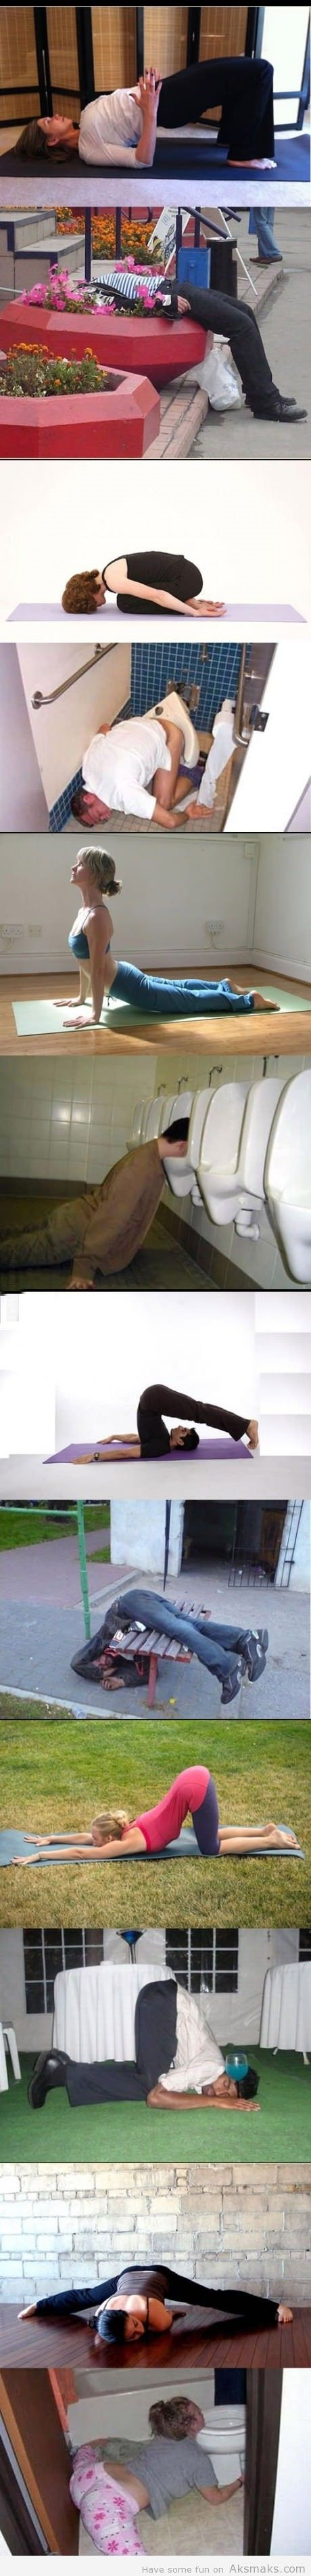 Yoga vs Booze...HEEEELARIOUS!!!!!